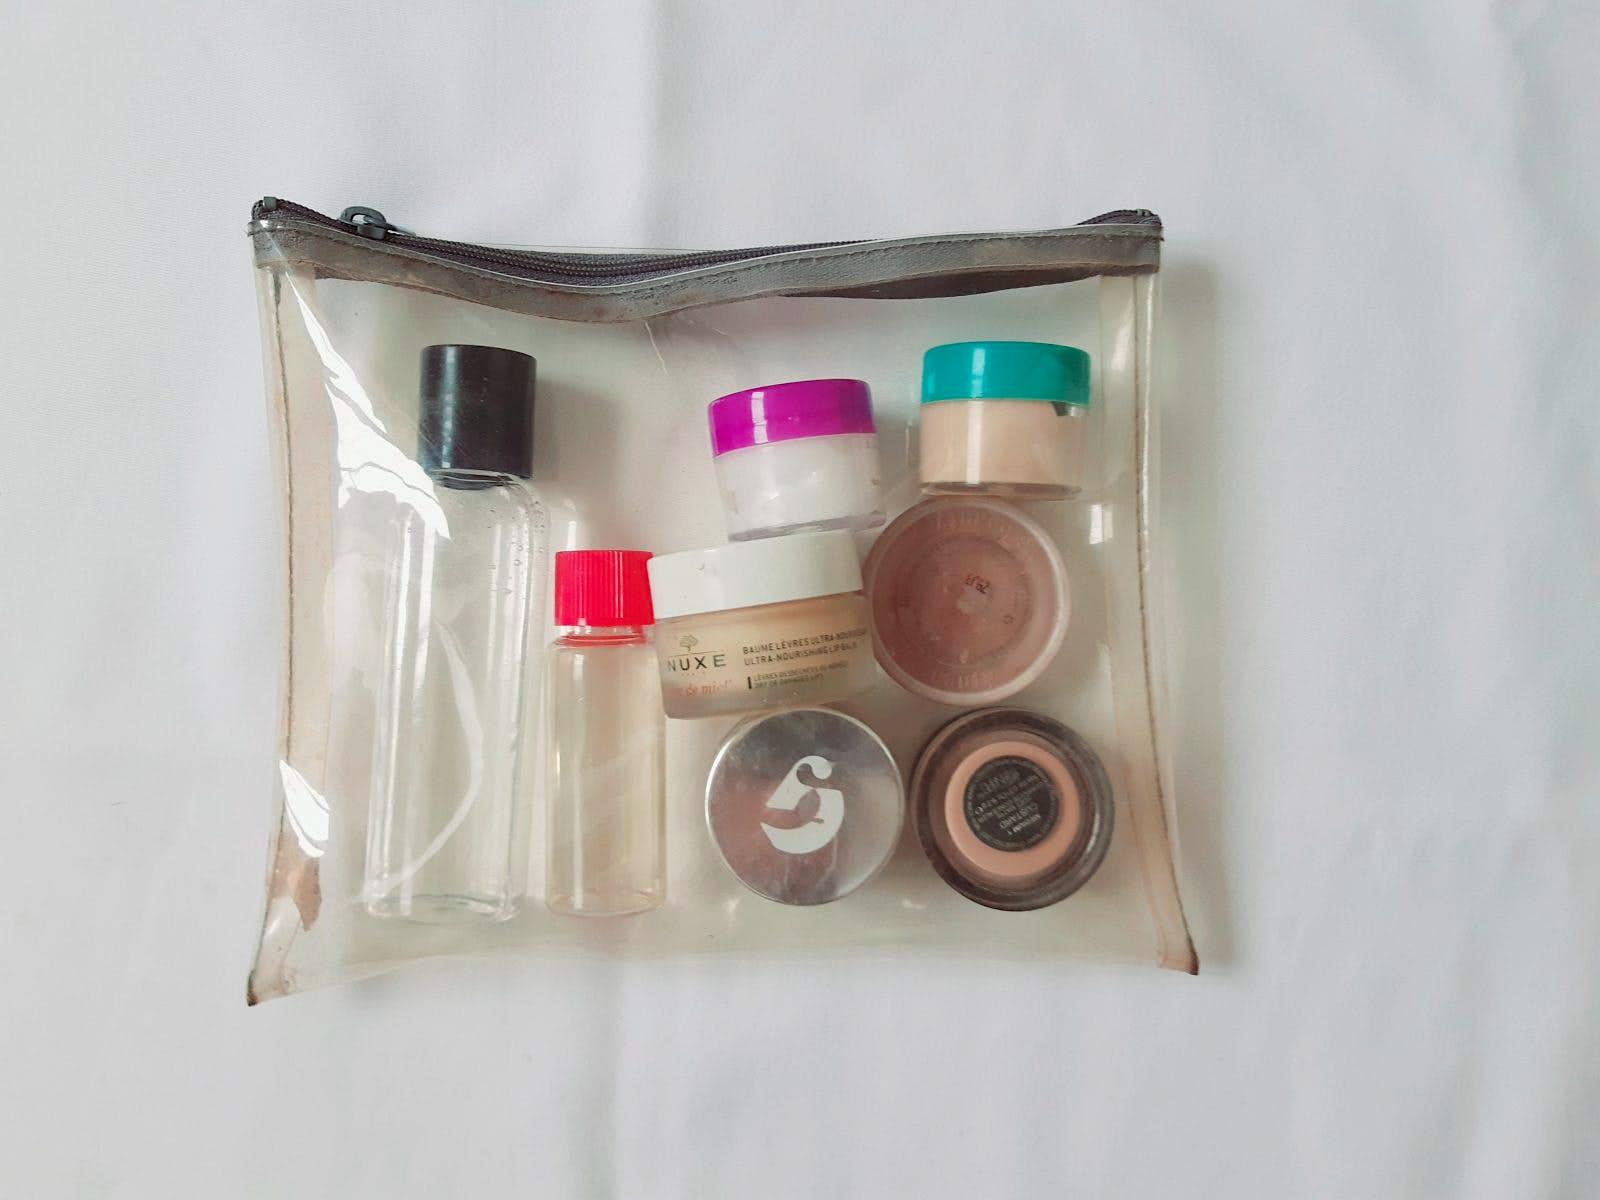 Travel News - Reduce waste